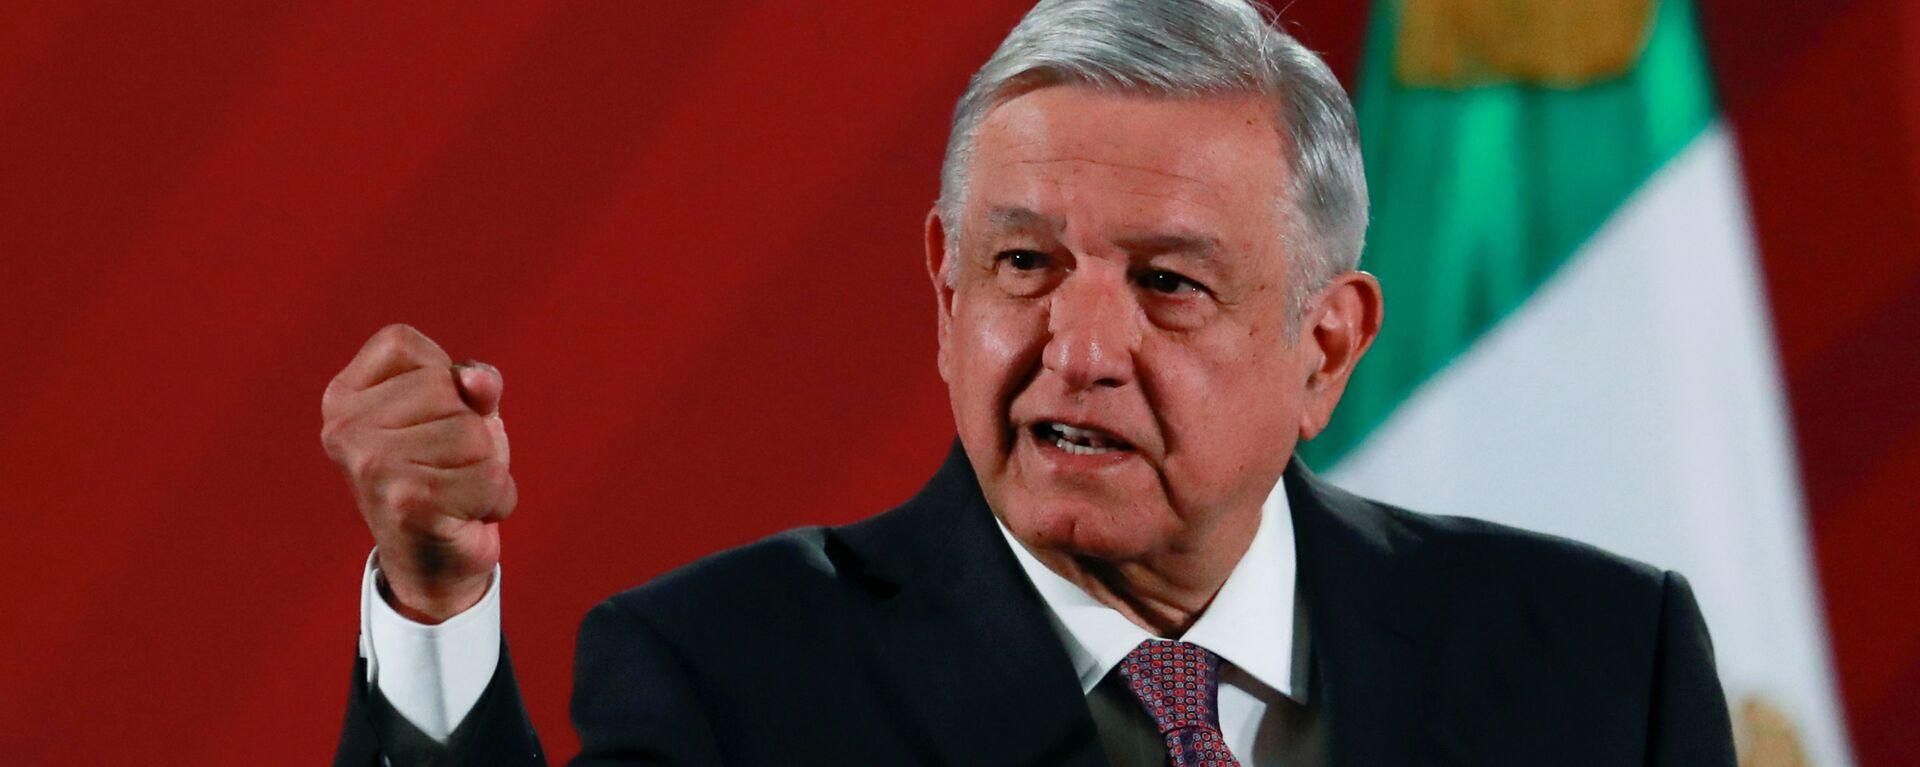 El presidente de México, Andrés Manuel López Obrador - Sputnik Mundo, 1920, 25.06.2020